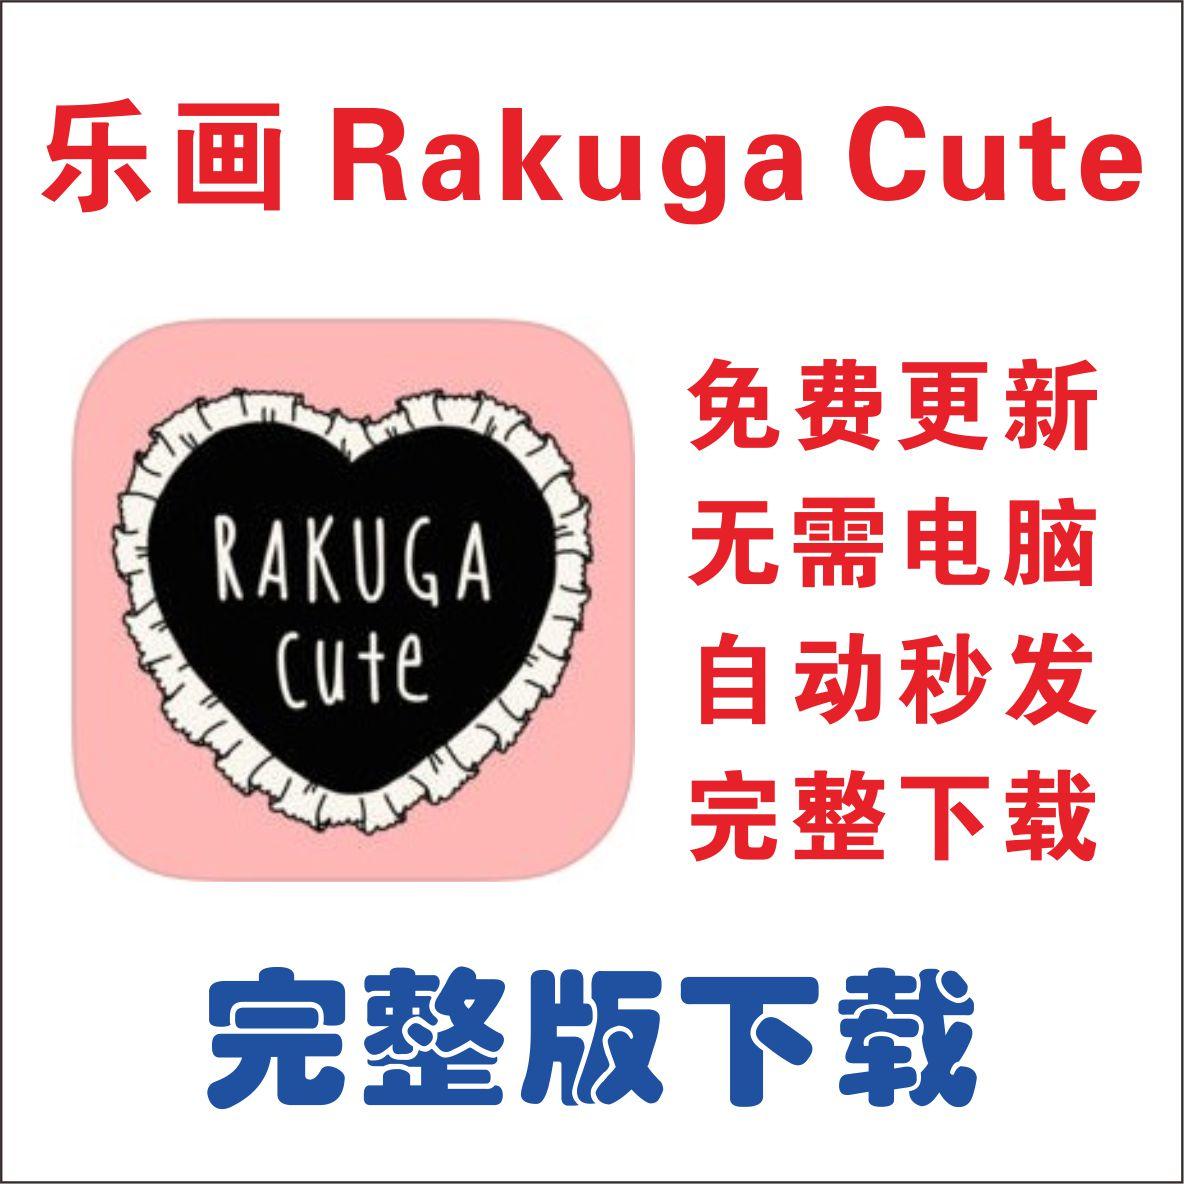 Музыка живопись Rskuga cute паста инжир наклейки рамка материал полная версия